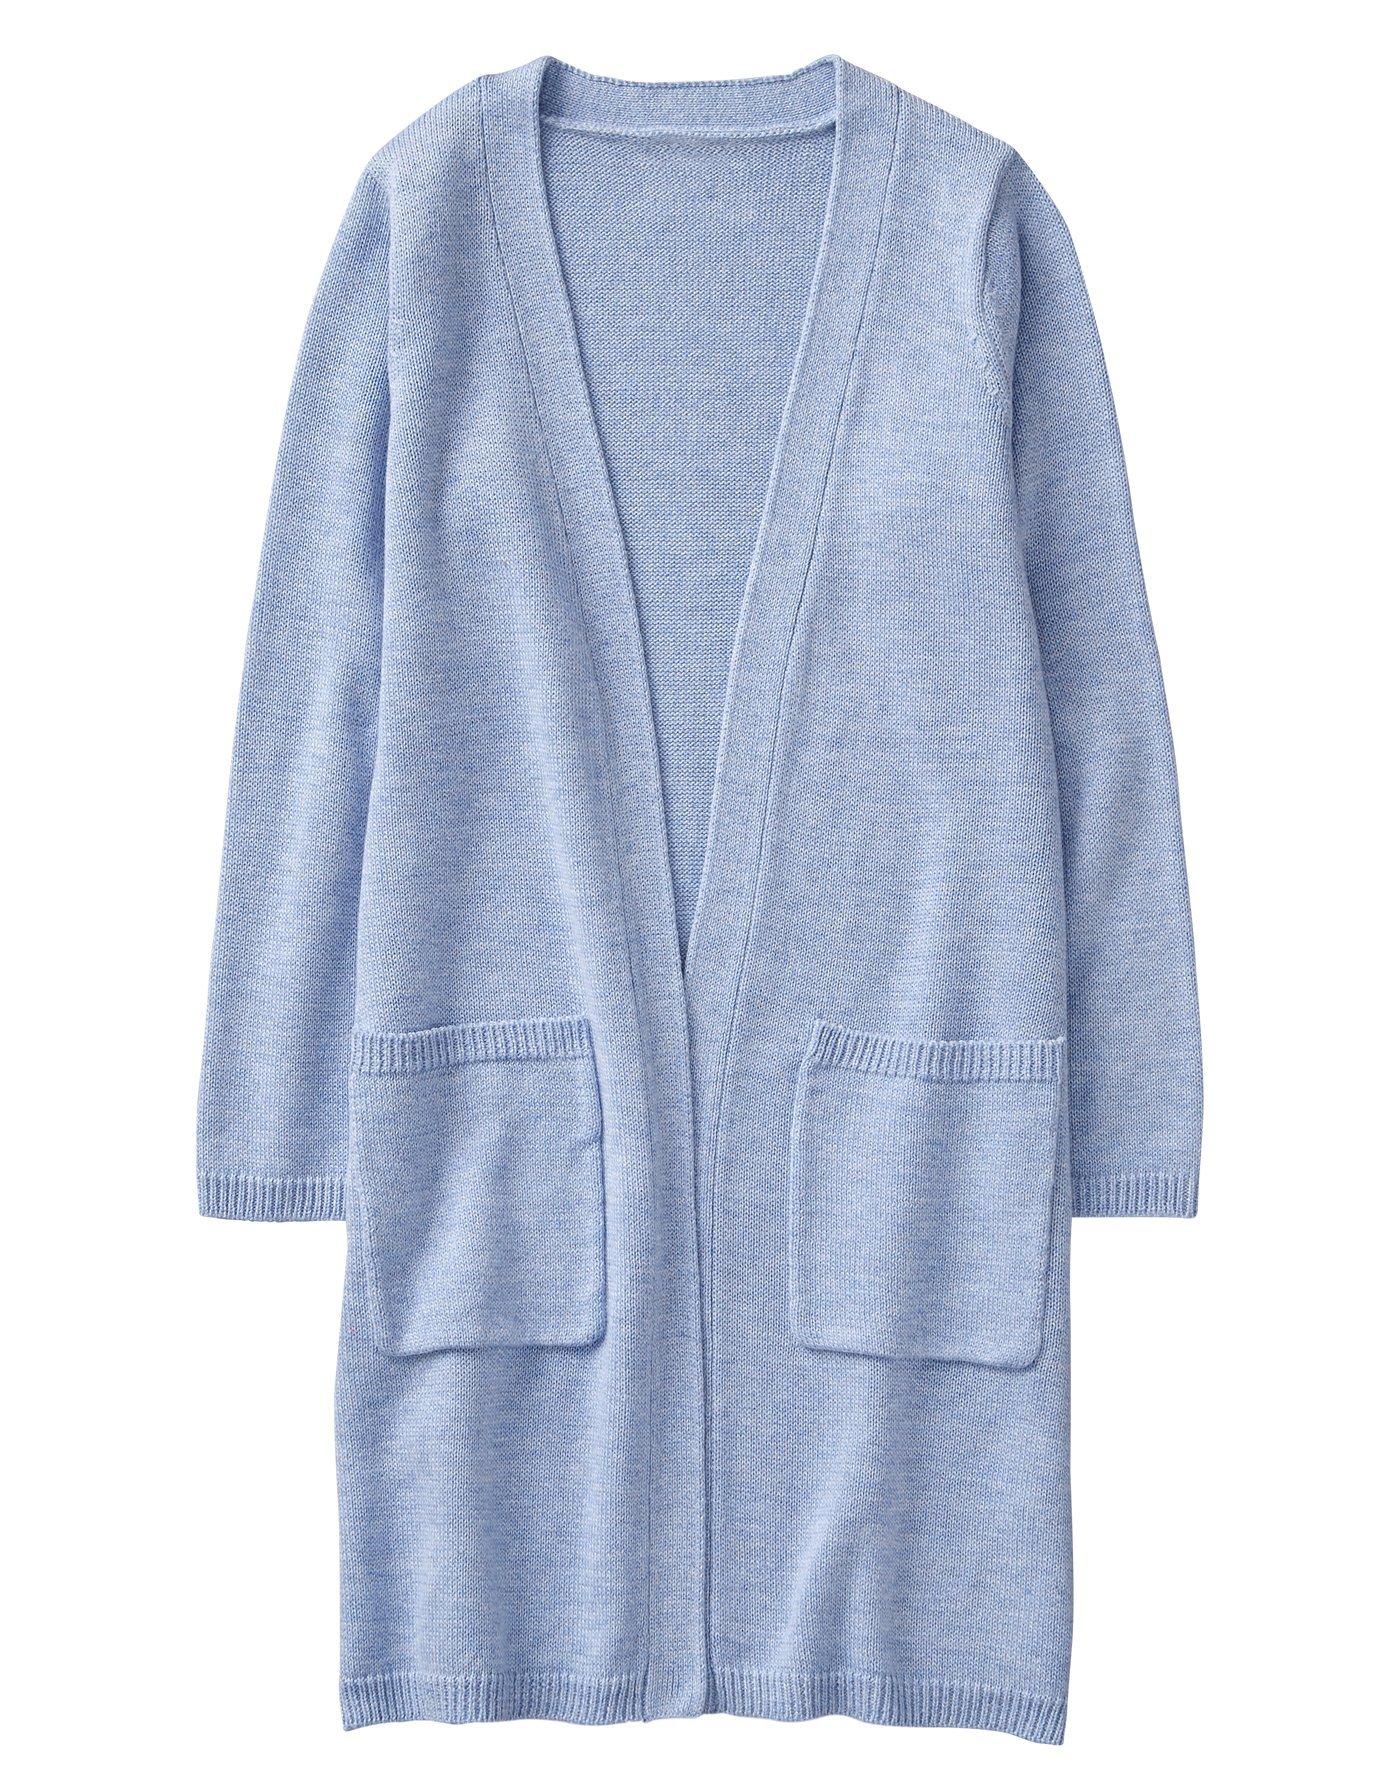 Gymboree Little Girls' Sleeve Long Cardigan, Periwinkle, XS